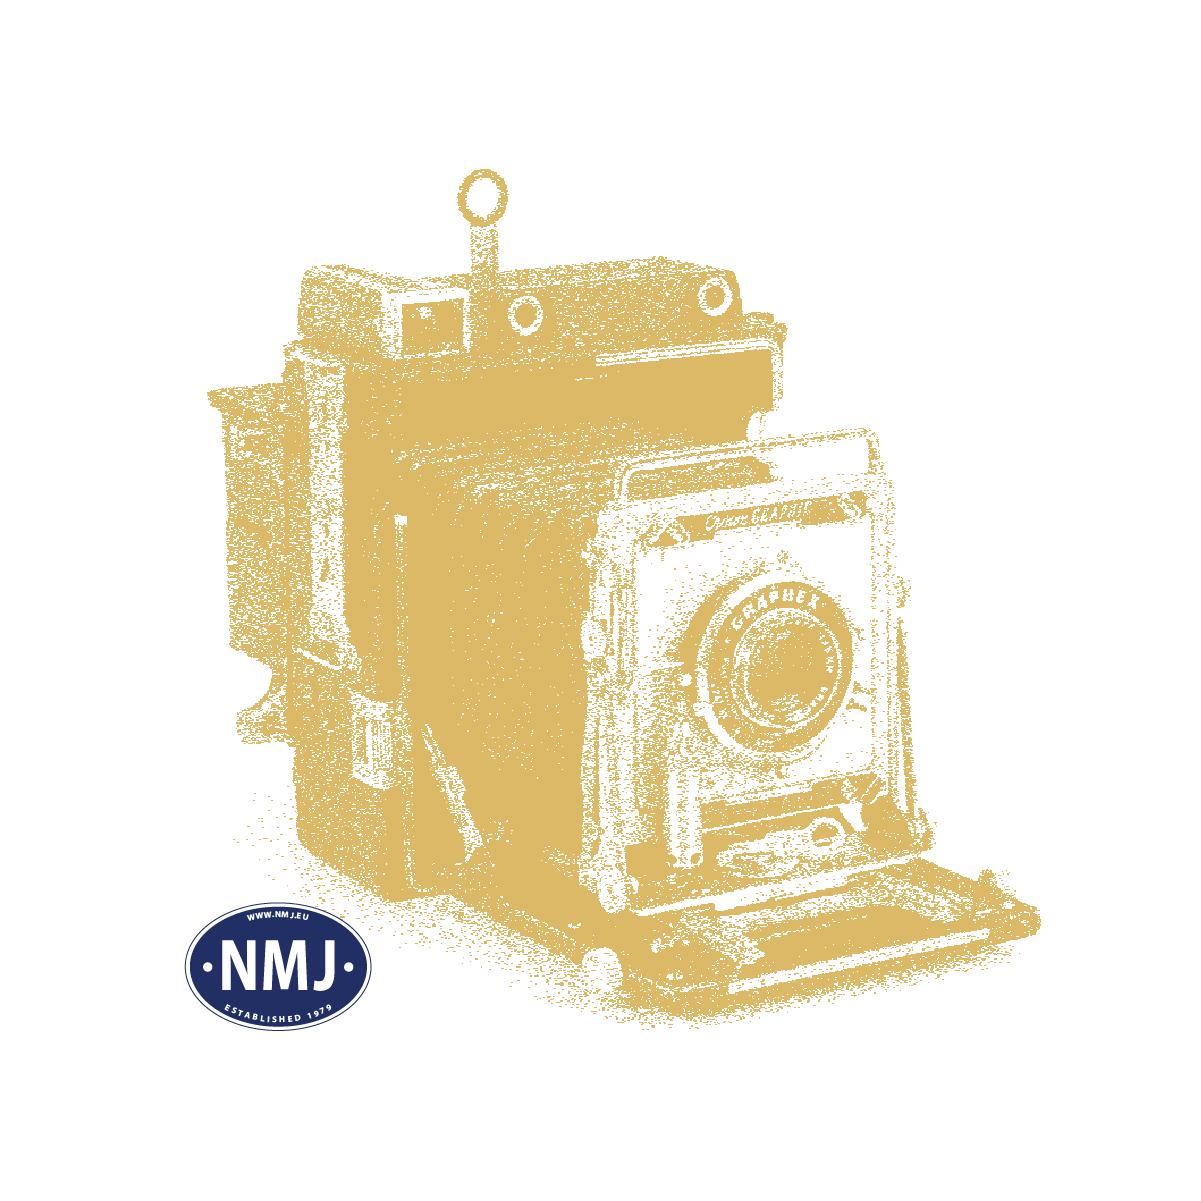 NMJT90205 - NMJ Topline MAV M61.019, DC